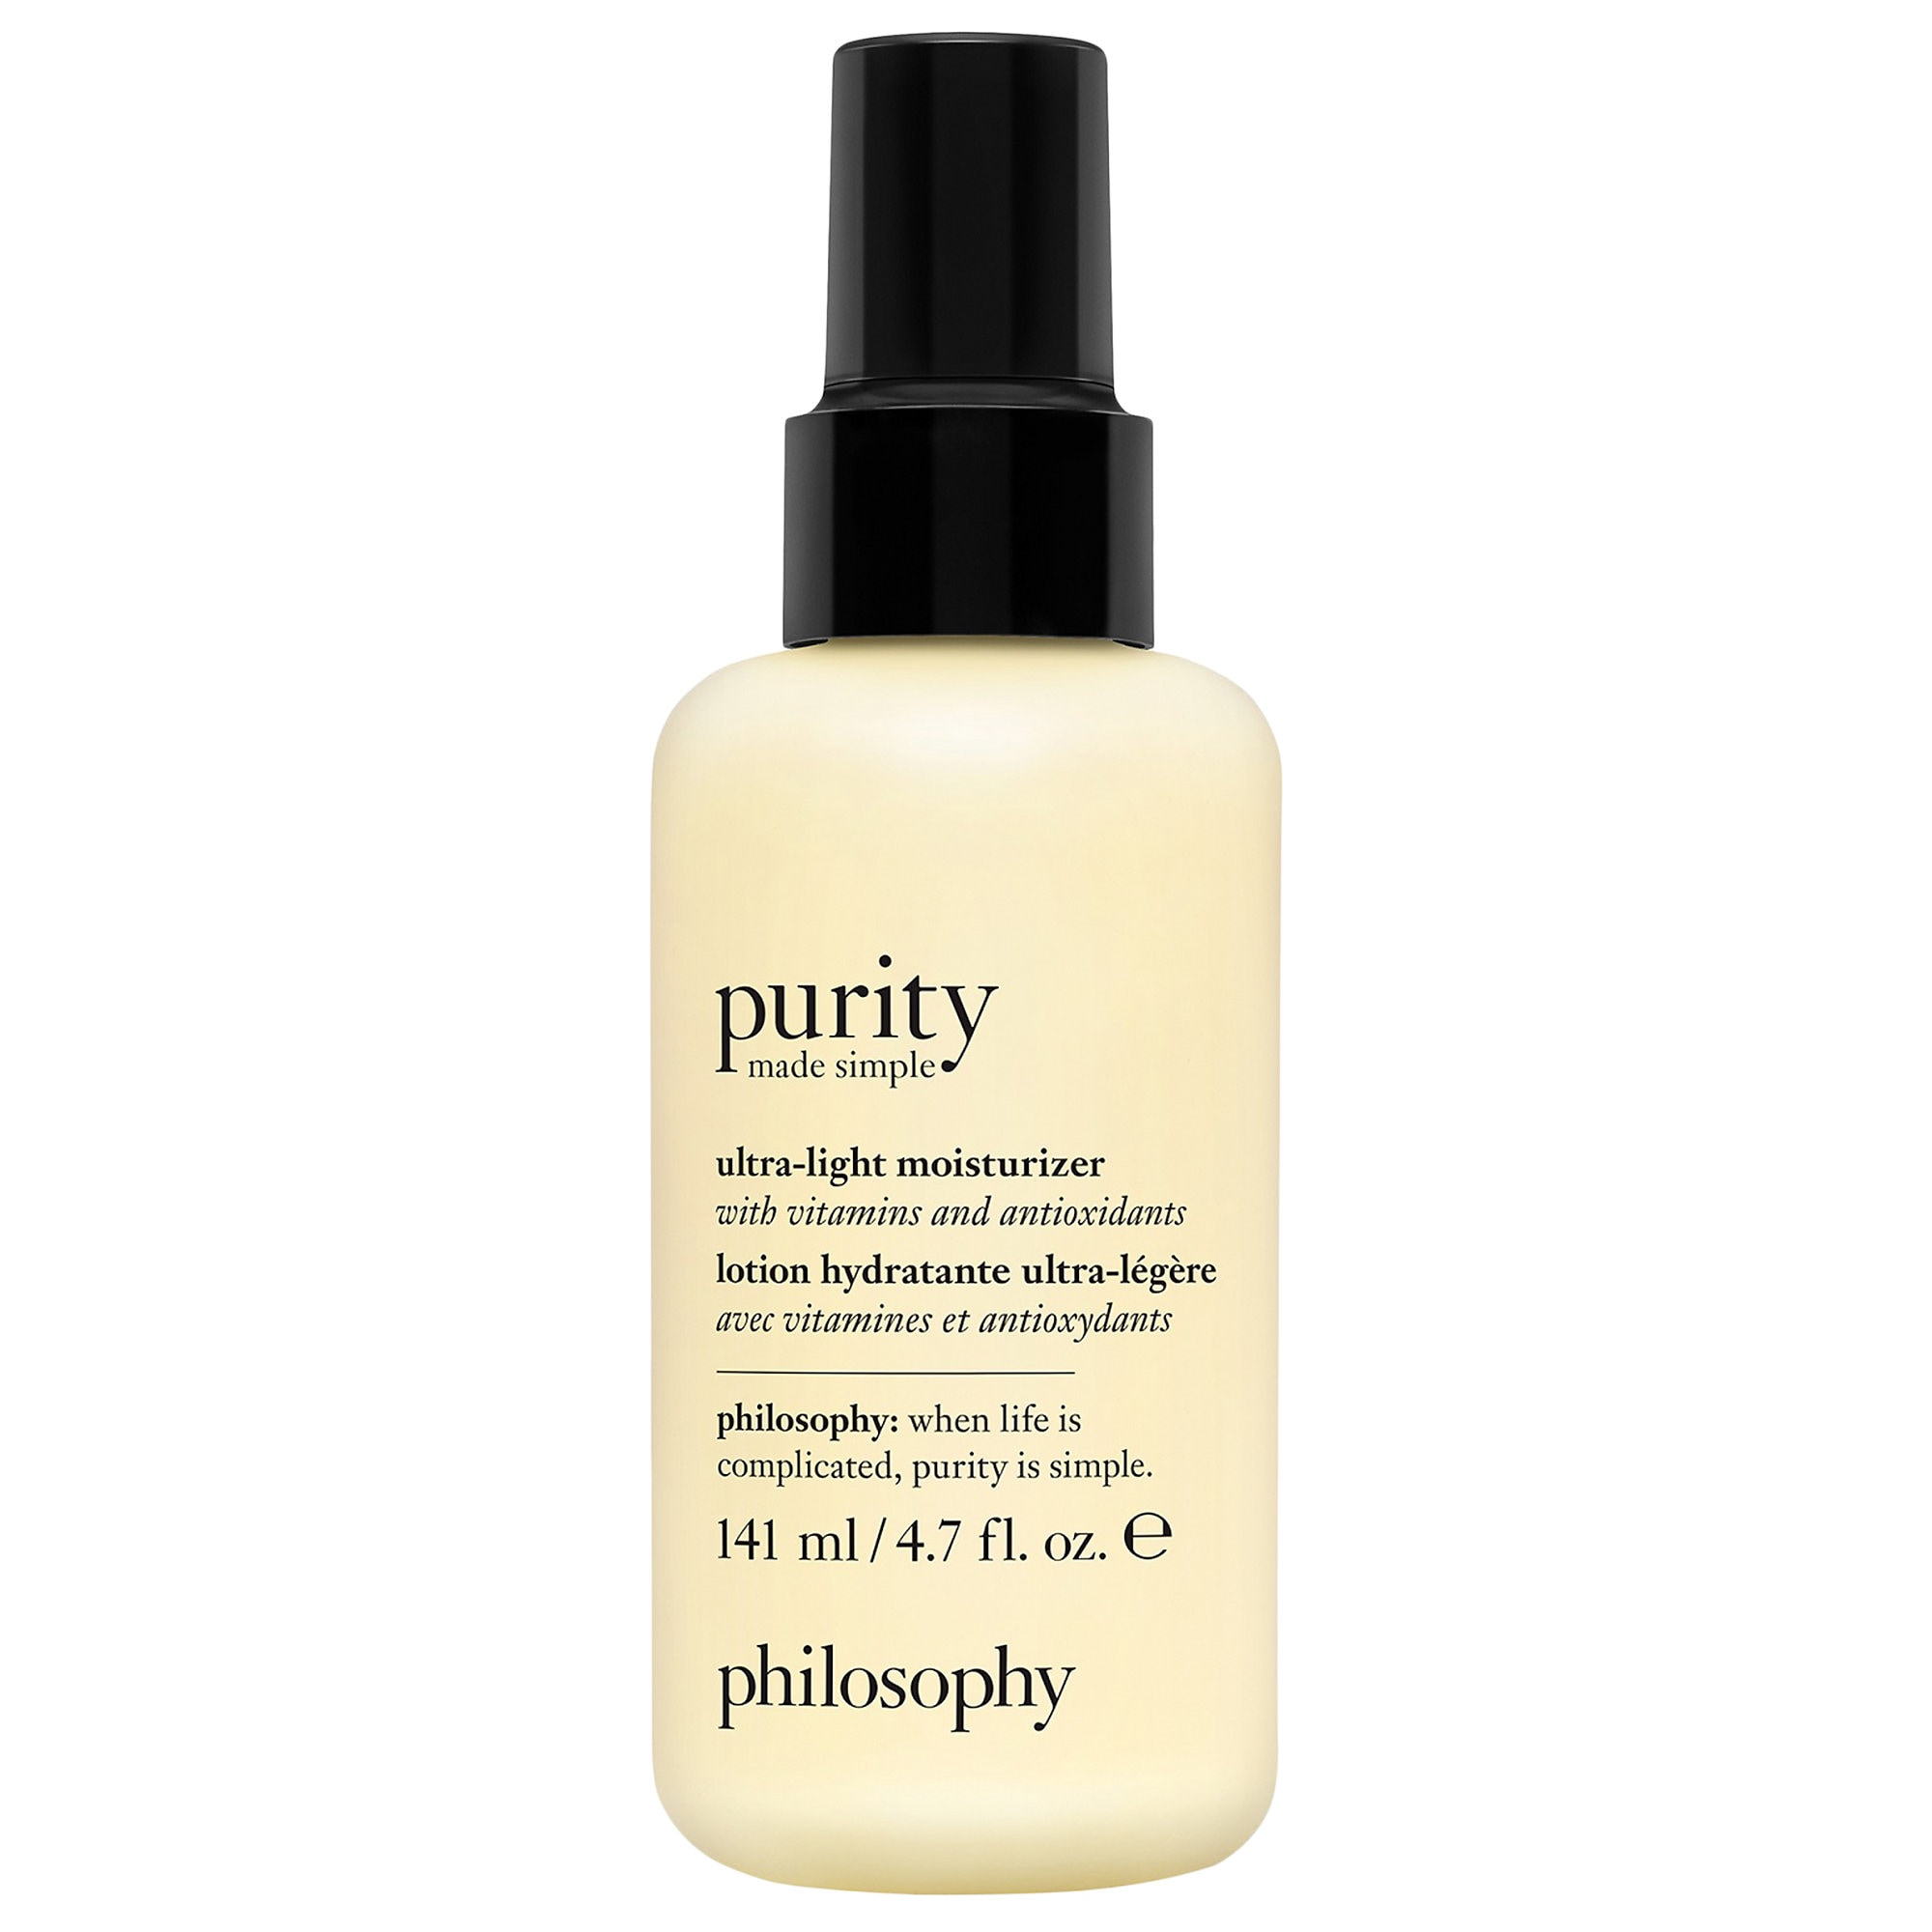 philosophy - Purity Made Simple Ultra-Light Moisturizer